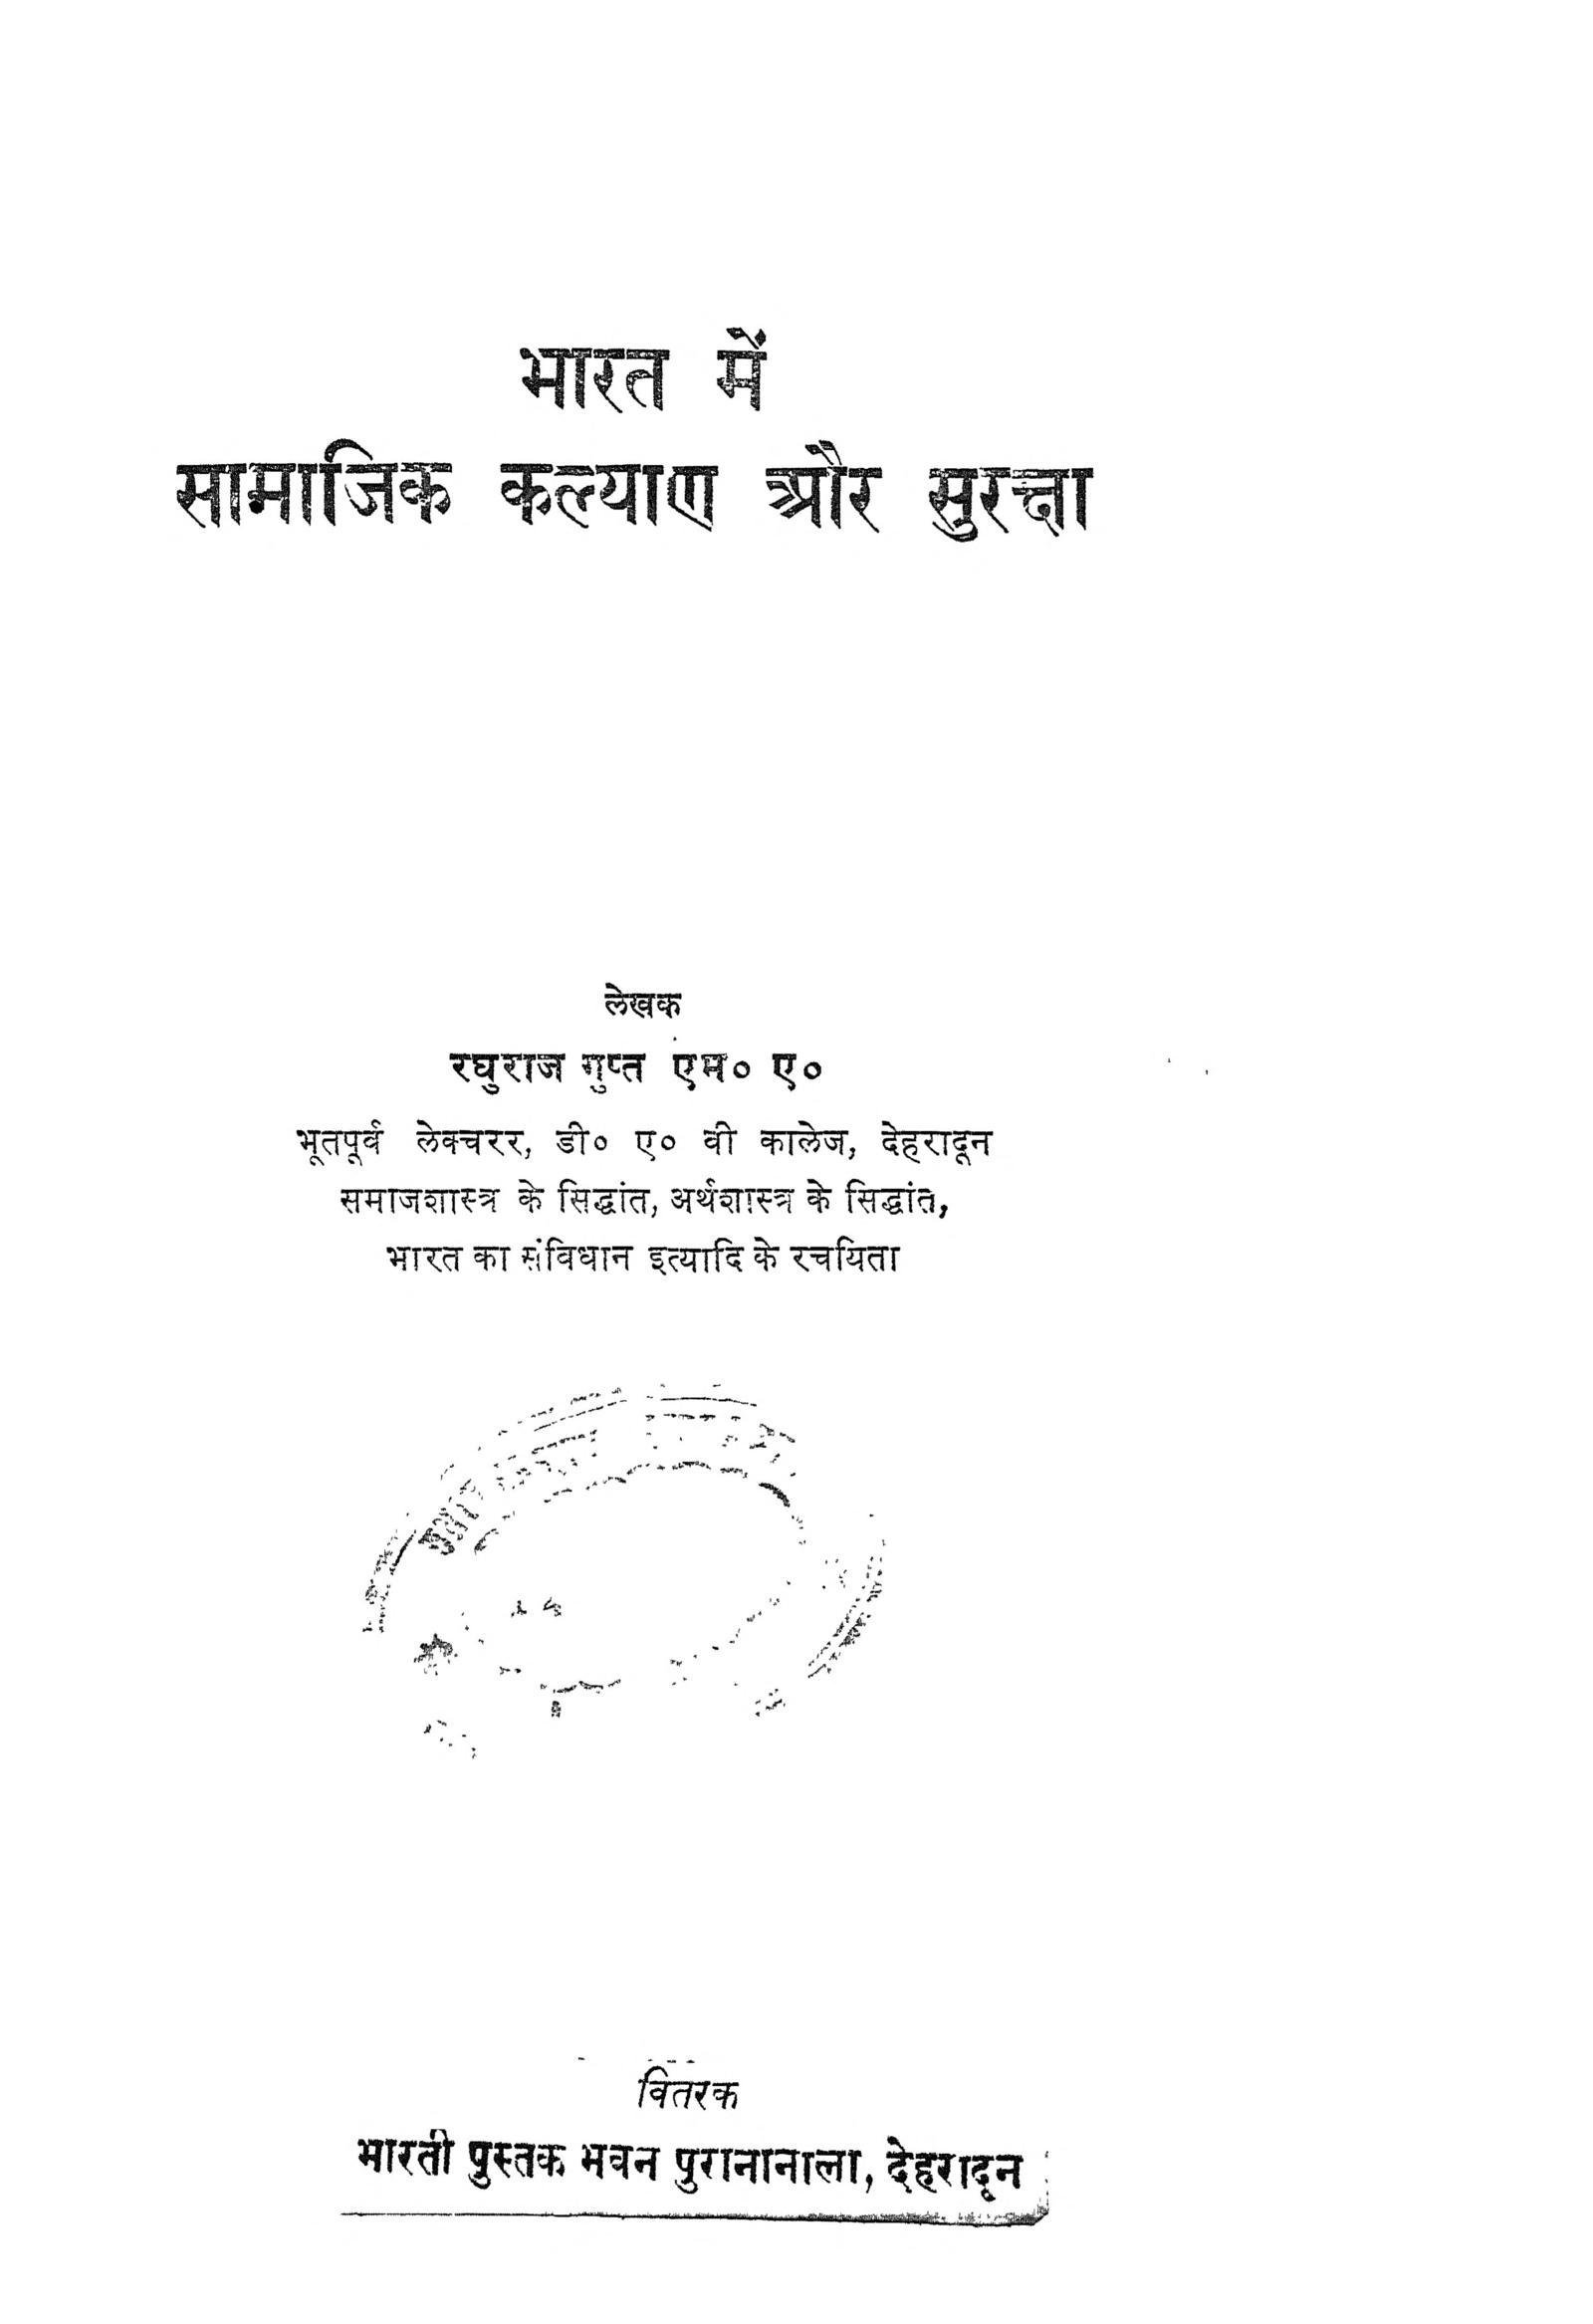 Book Image : भारत में सामाजिक कल्याण और सुरक्षा  - Bharat Men Samajik Kalyan Aur Suraksha